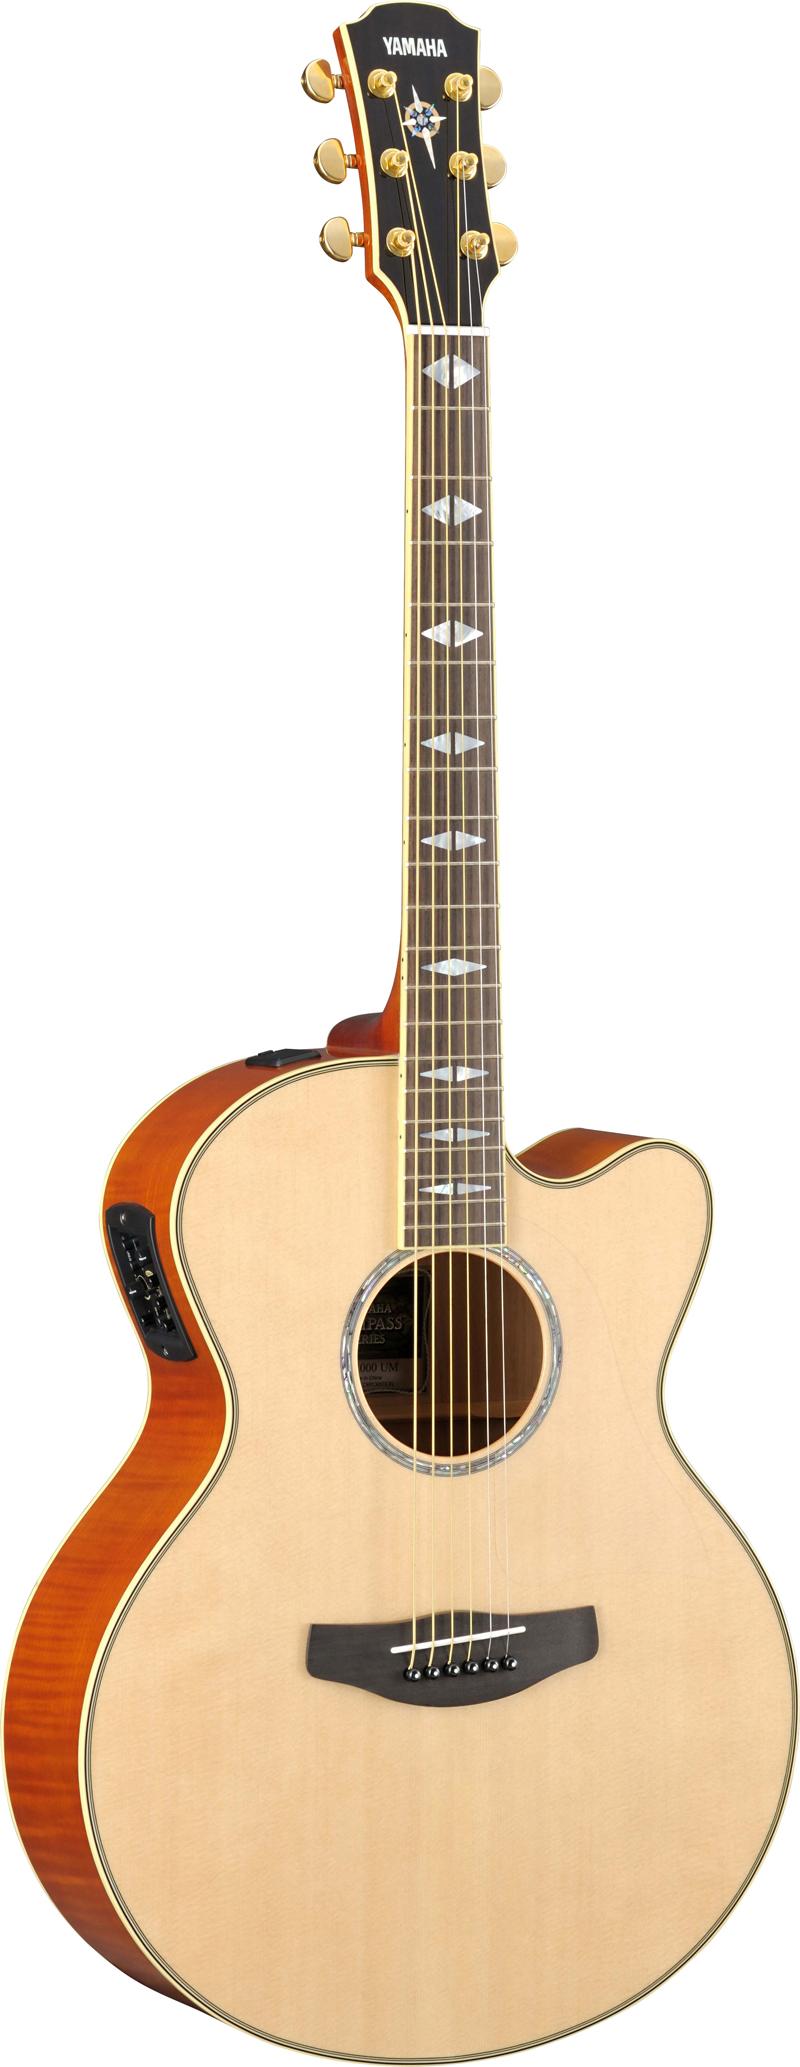 yamaha cpx1000 nt elektro akustik gitarre natur gitarre. Black Bedroom Furniture Sets. Home Design Ideas